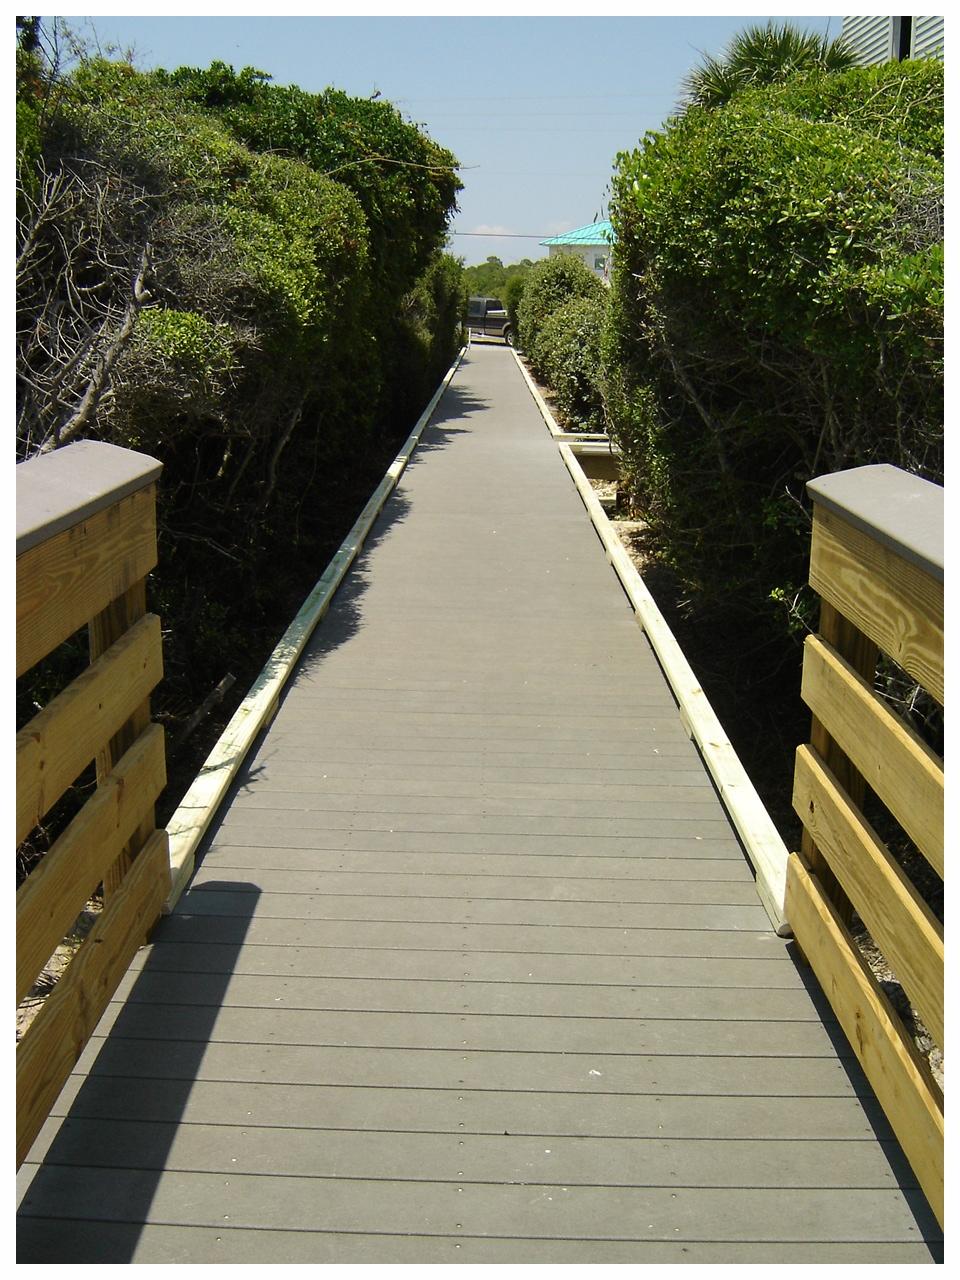 Beach Boardwalk Access